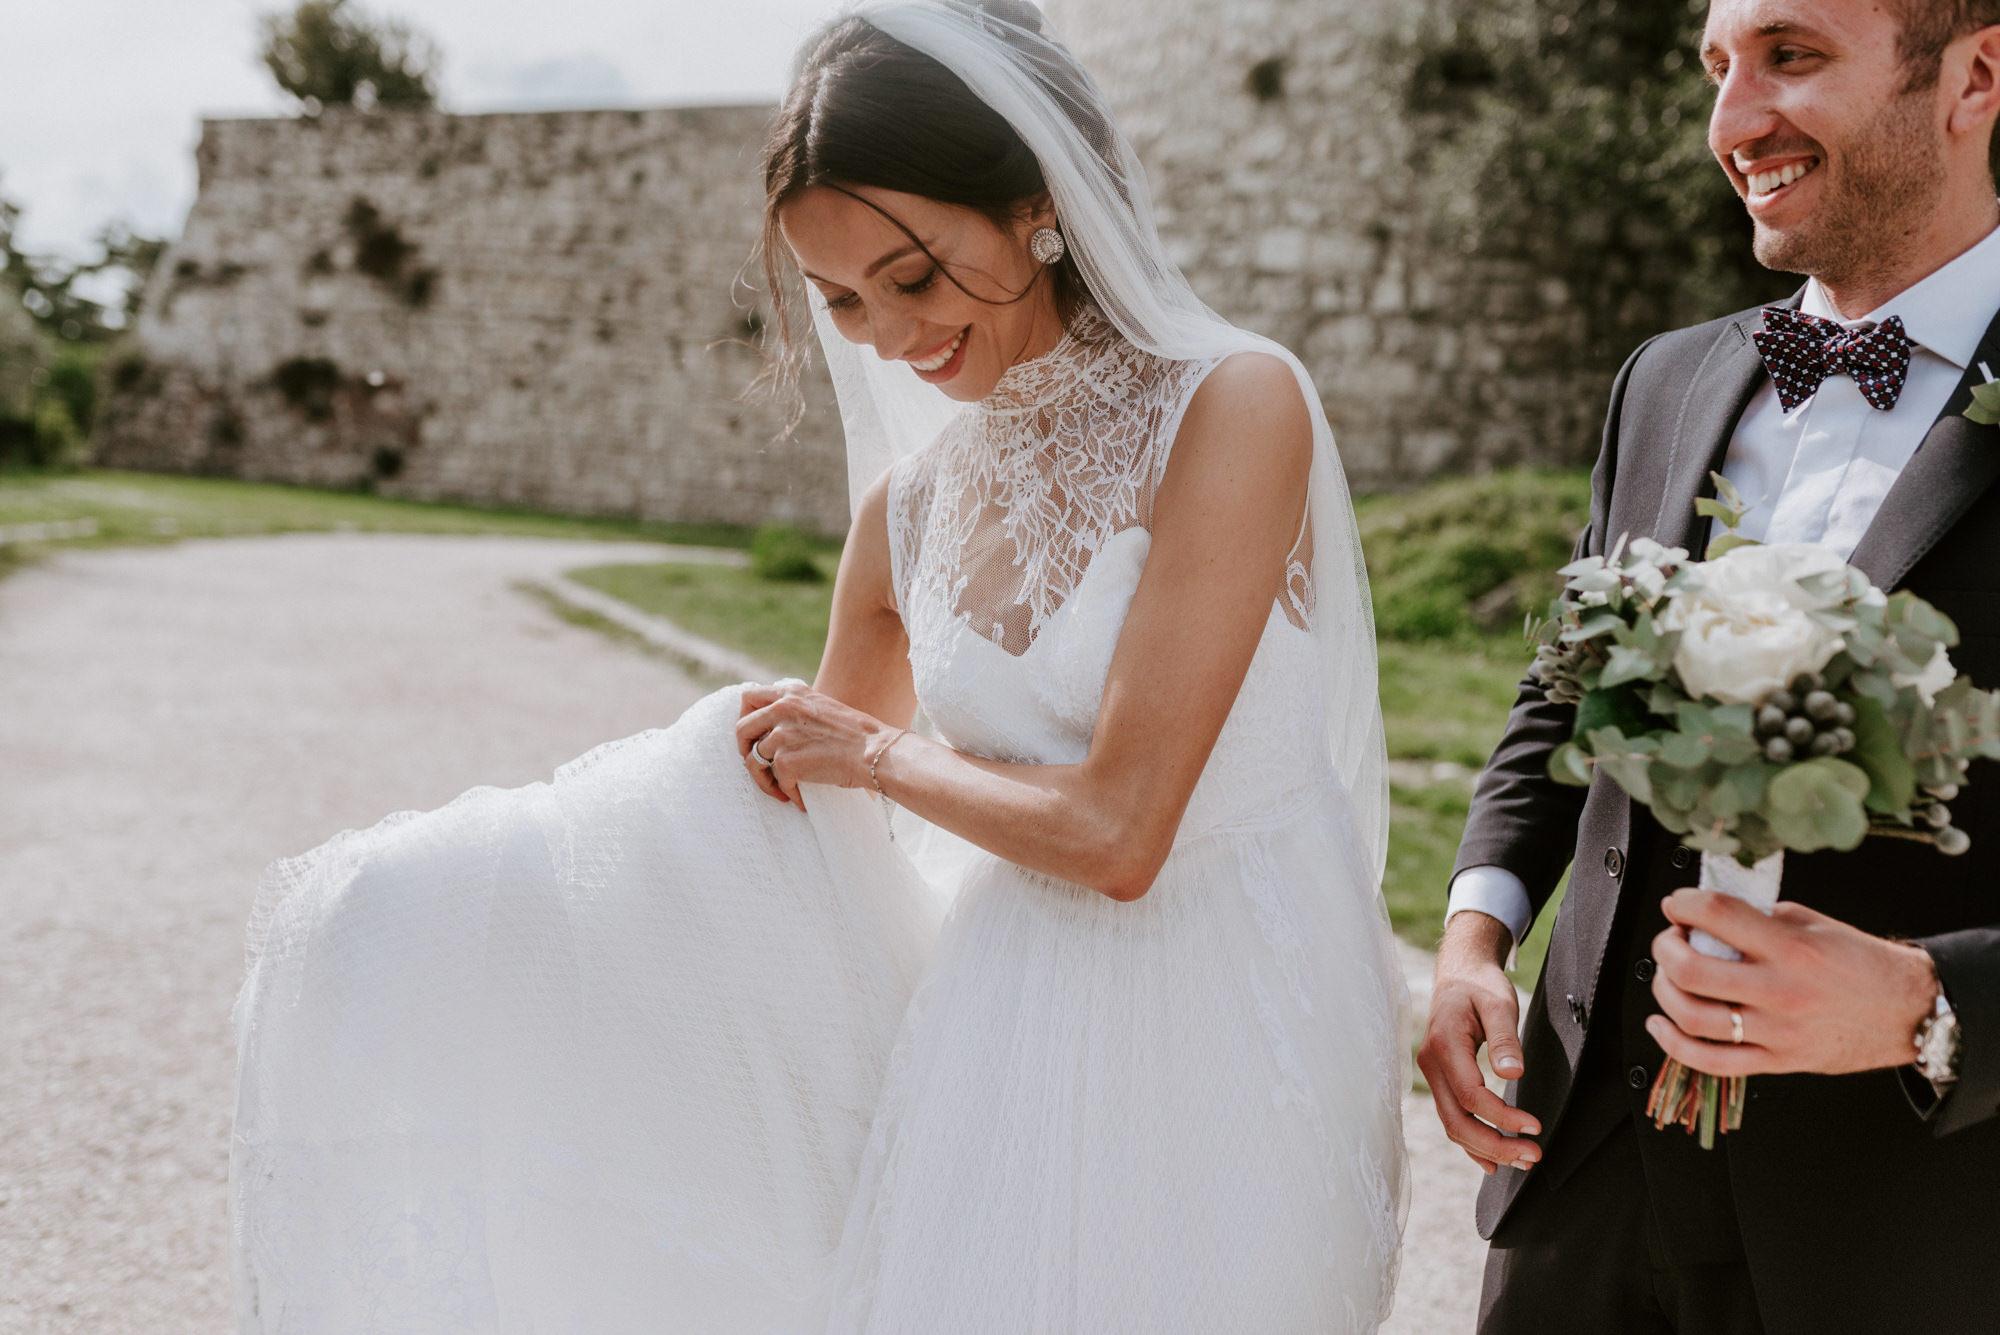 FOTO+PHOTO+BODA+WEDDING+ITALIA+ITALY+MAURICIO+GARAY+MAURICIOGARAY+WEDDINPHOTOGRAPHER+FOTOGRAFODEBODA-1243.jpg